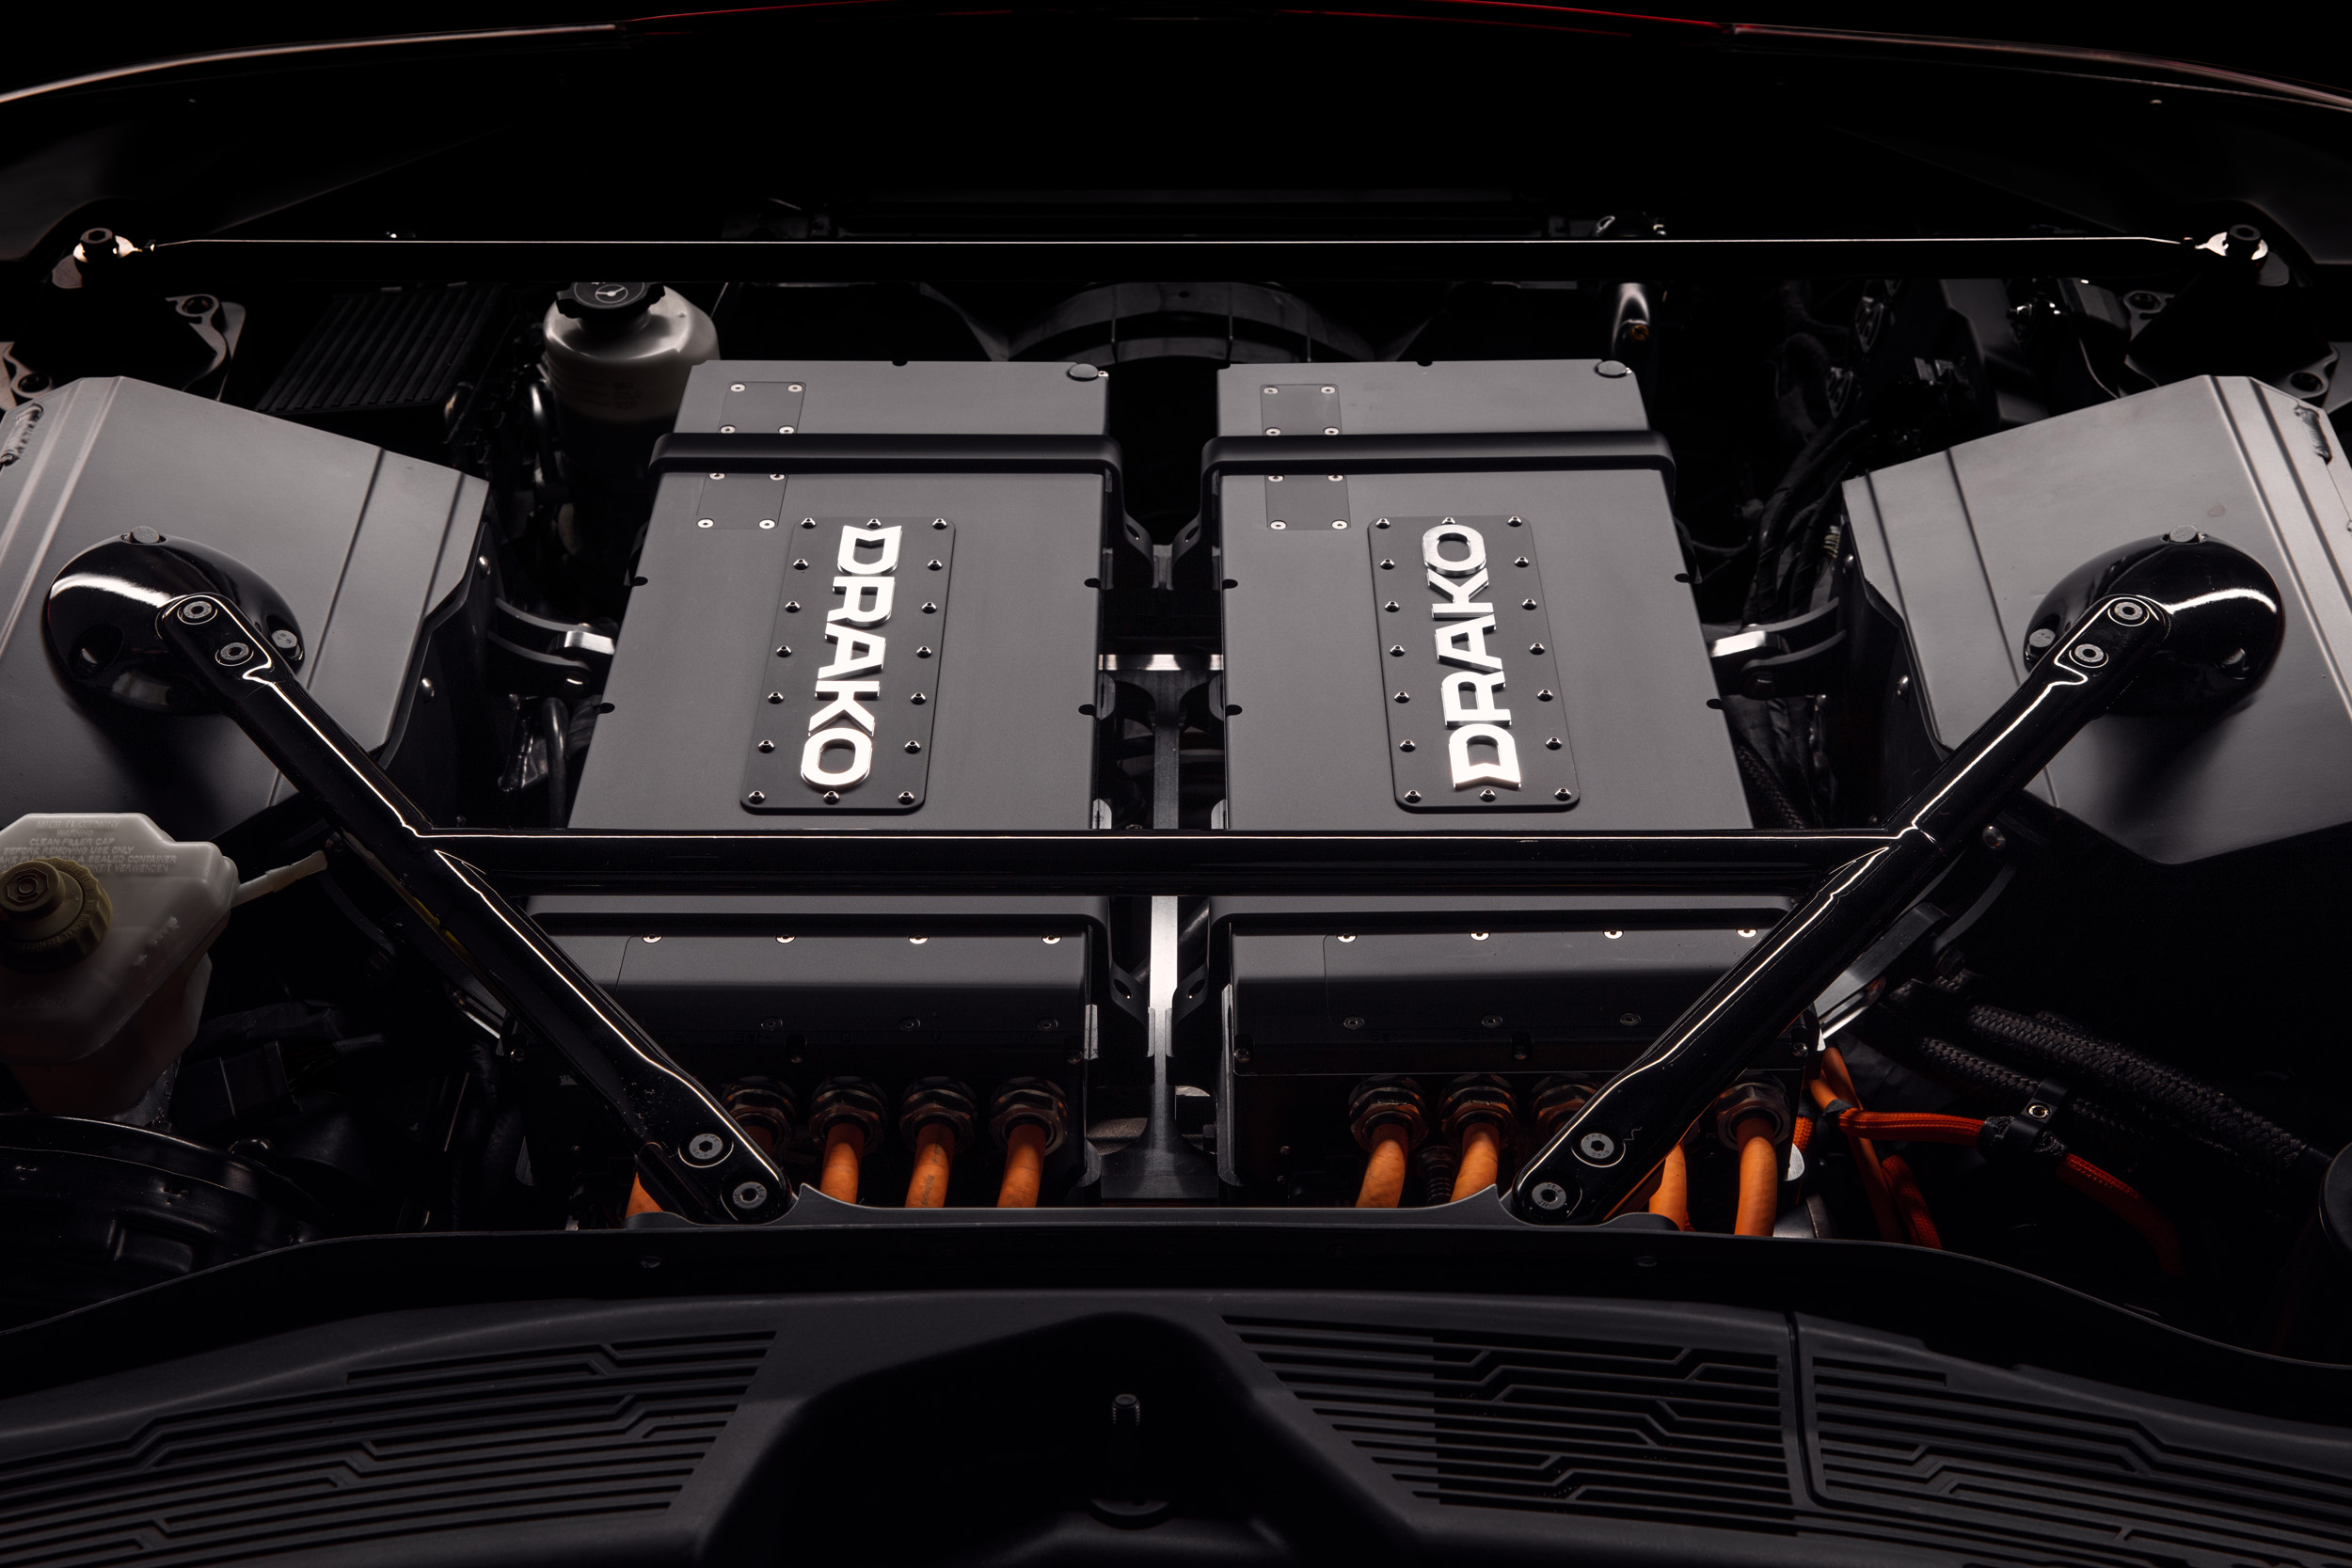 All drivetrain components were developed by Drako Motors